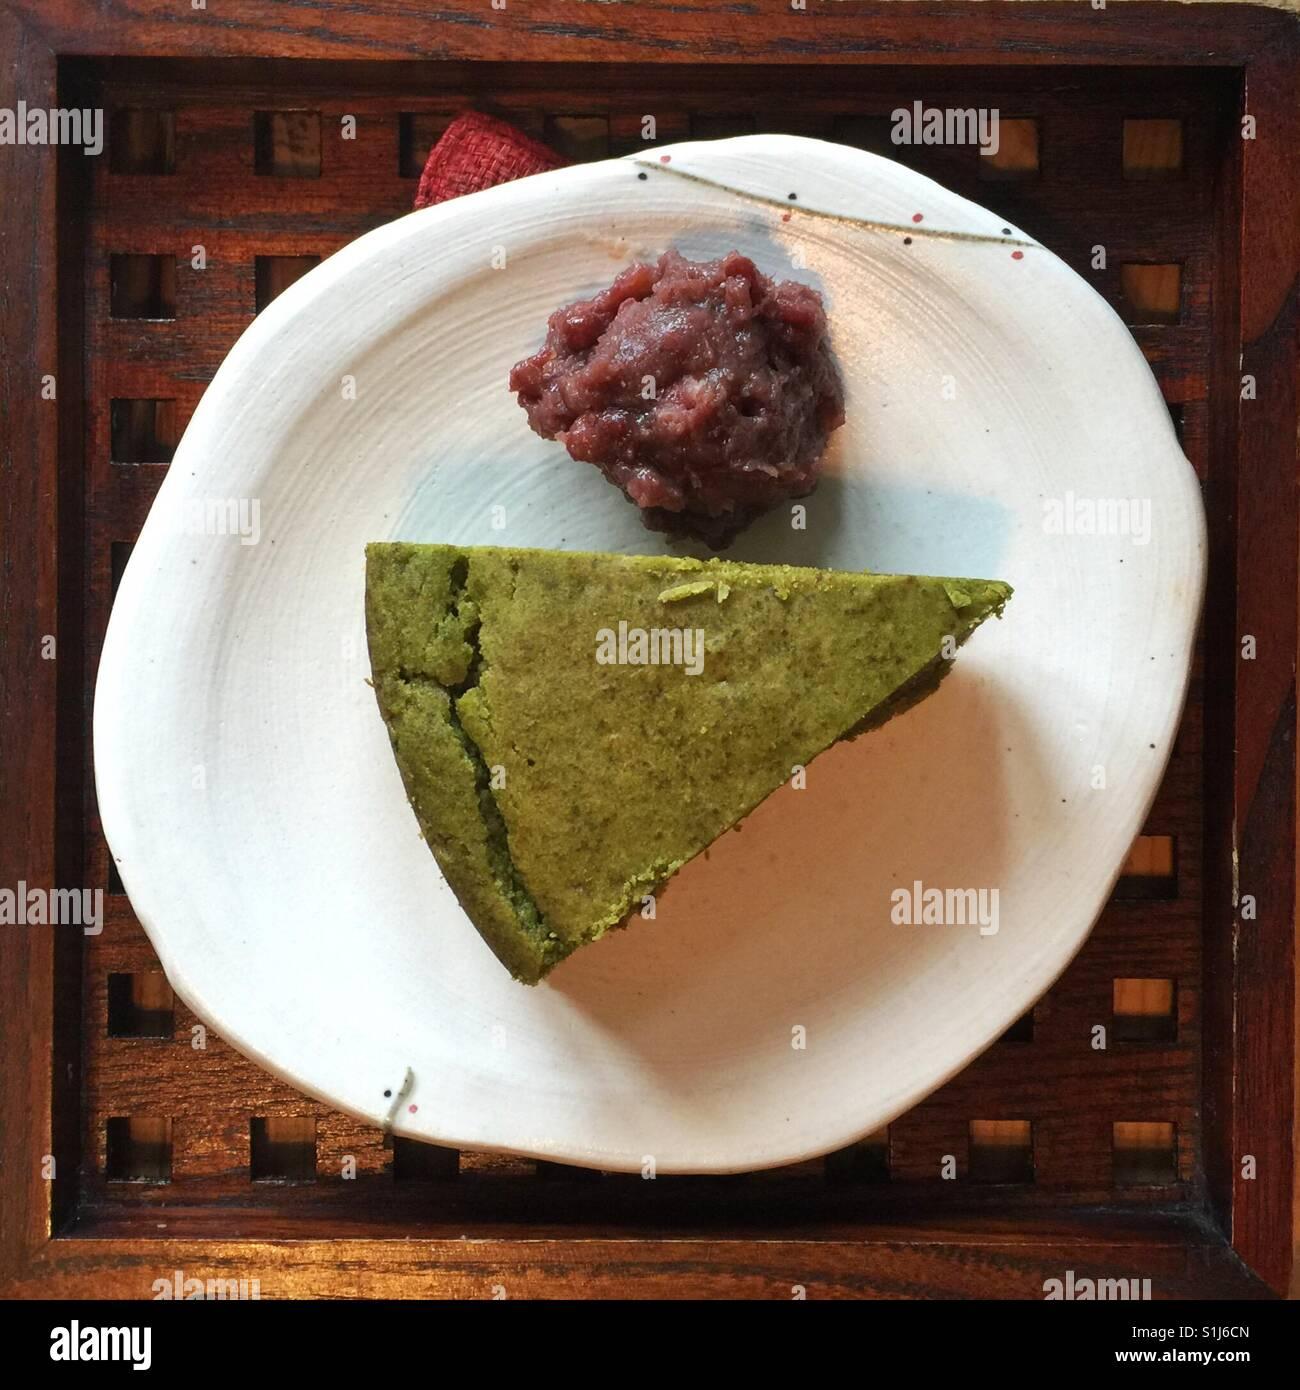 Japanese green matcha tea cake on handmade ceramic plate - Stock Image